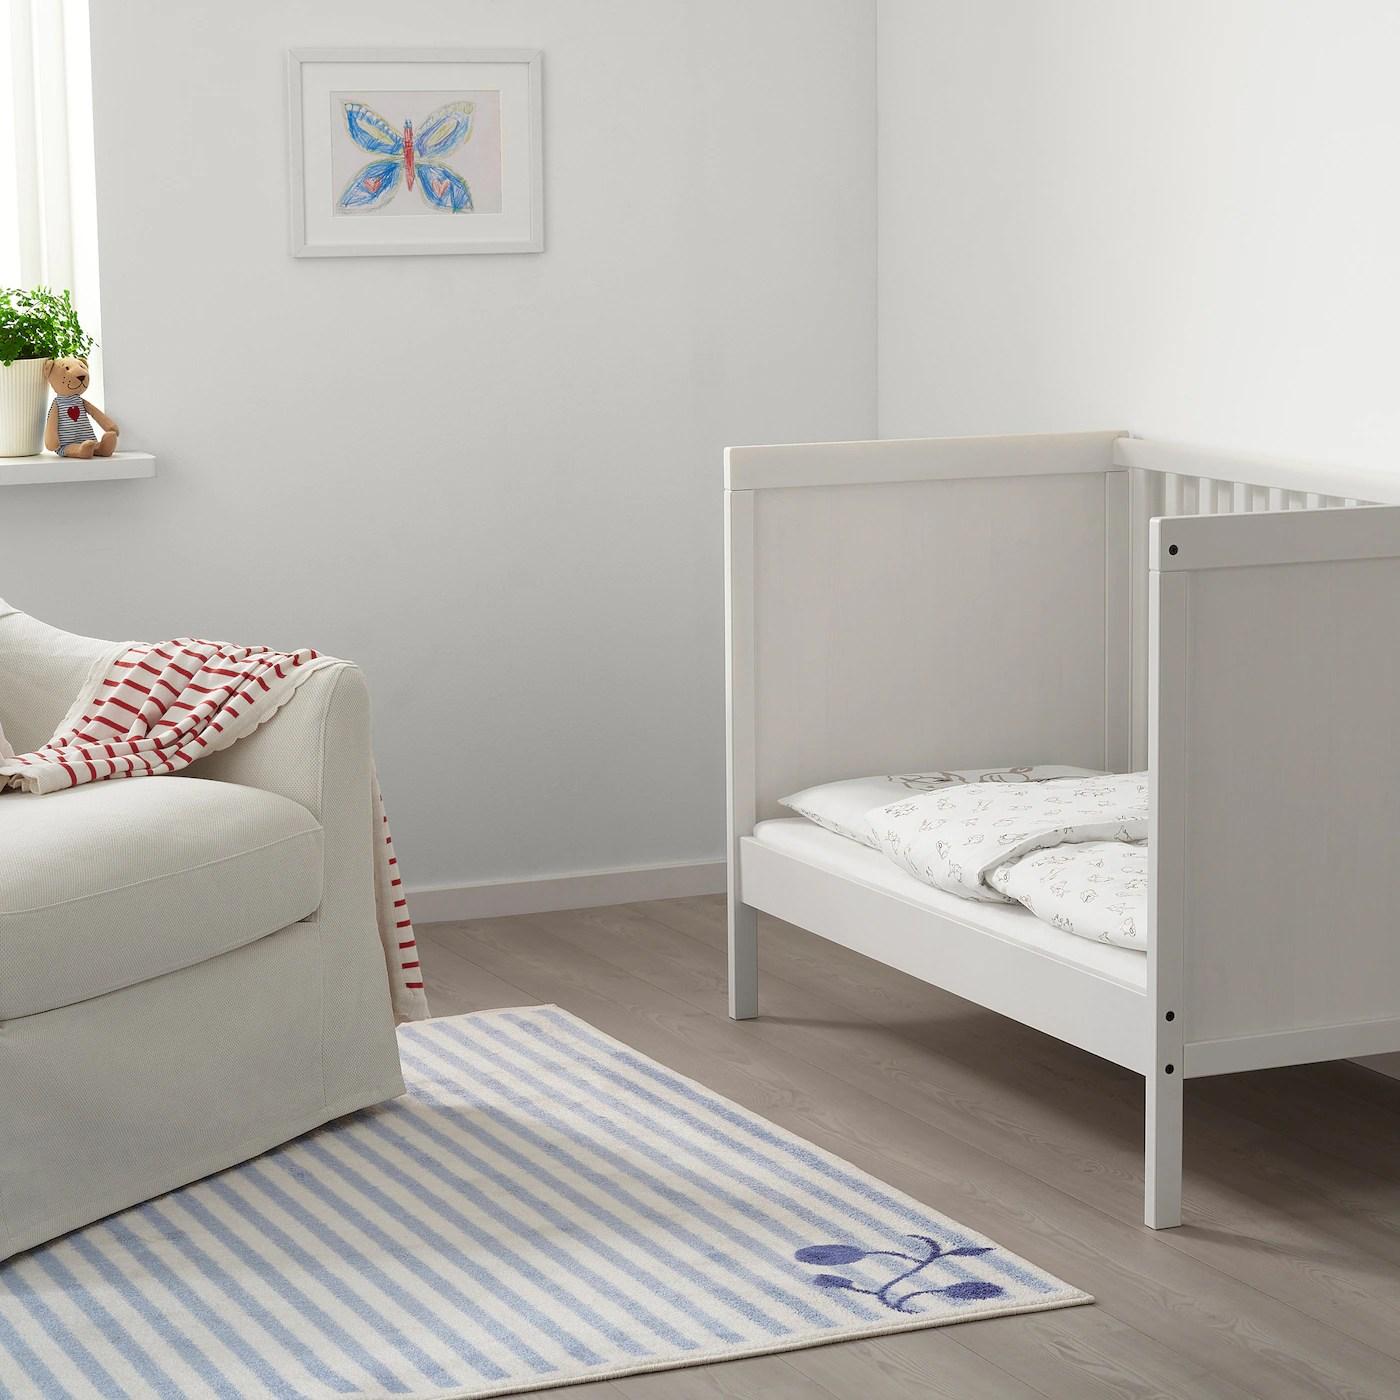 rodhake housse couette et taie bebe motif lapin blanc beige 110x125 35x55 cm